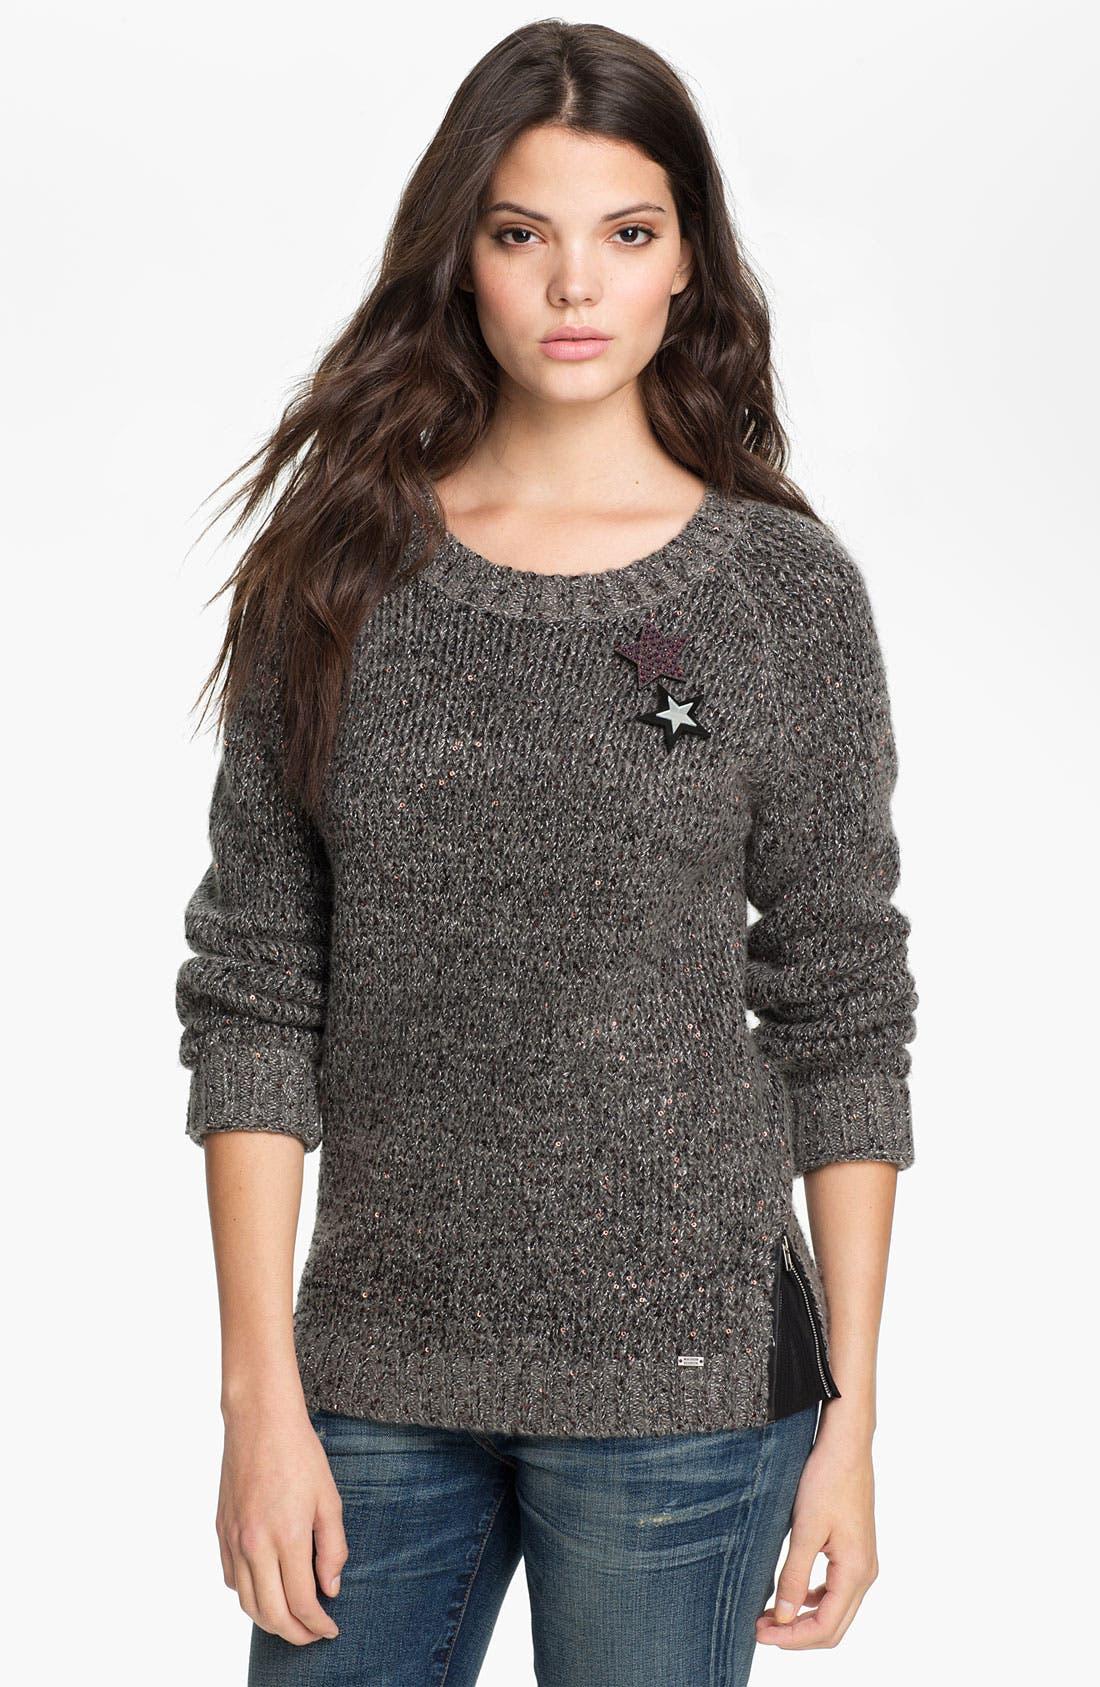 Alternate Image 1 Selected - Maison Scotch Sequin Sweater